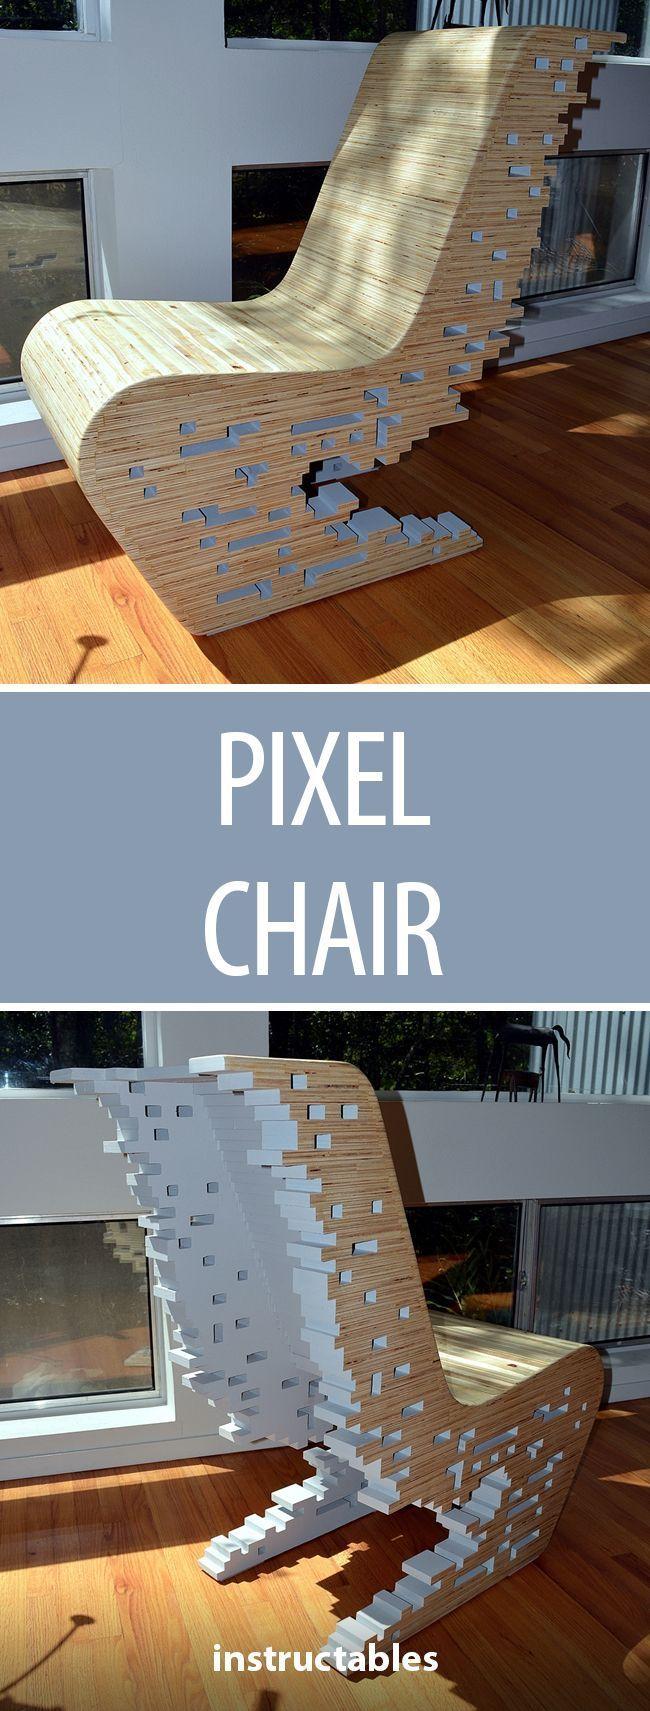 Pixel Chair Fun Furniture Holzarbeiten Outdoor M 246 Bel